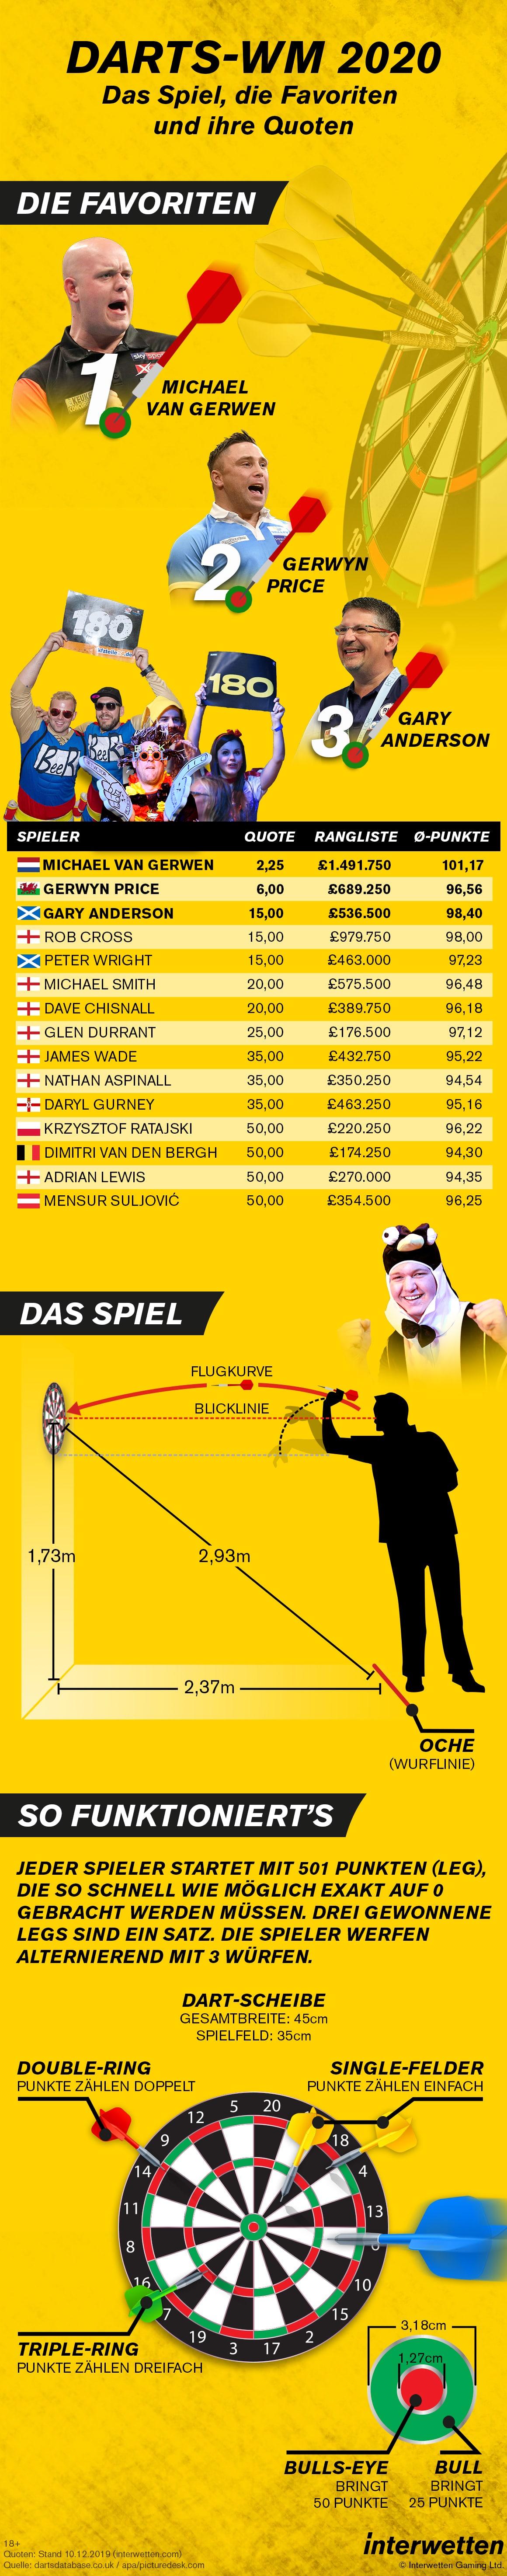 Infografik_Darts_WM_2020